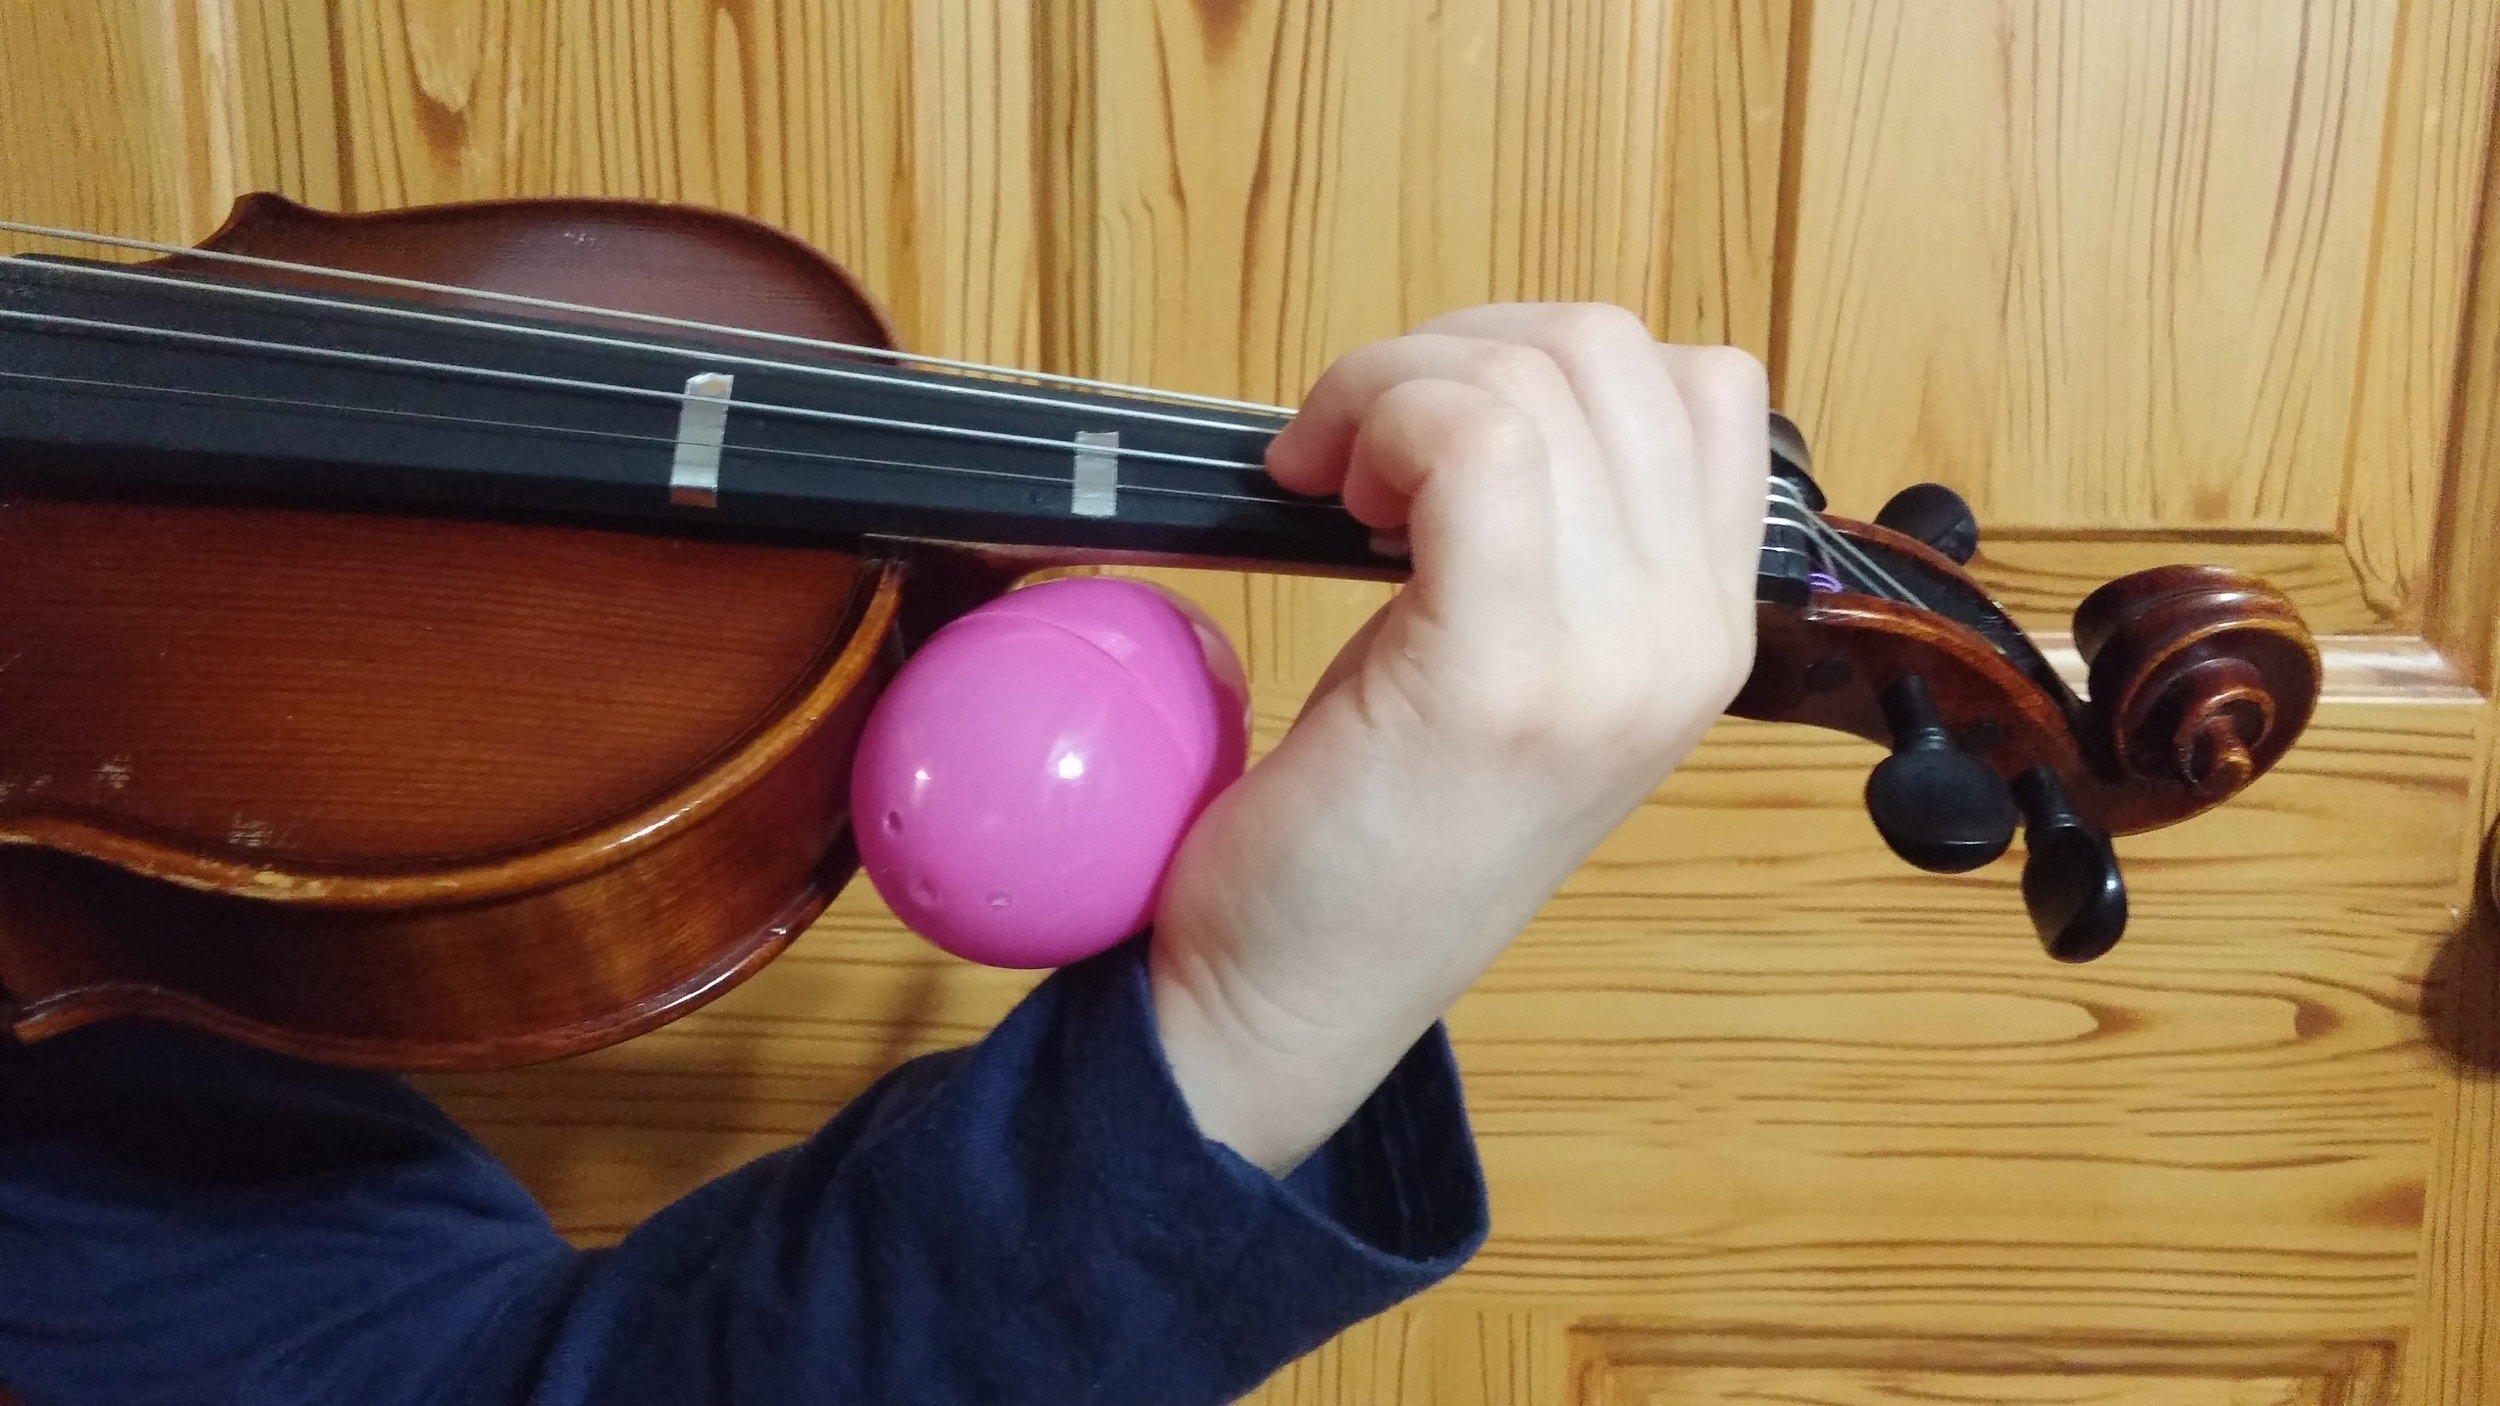 violintechniqueleftwrist.jpg